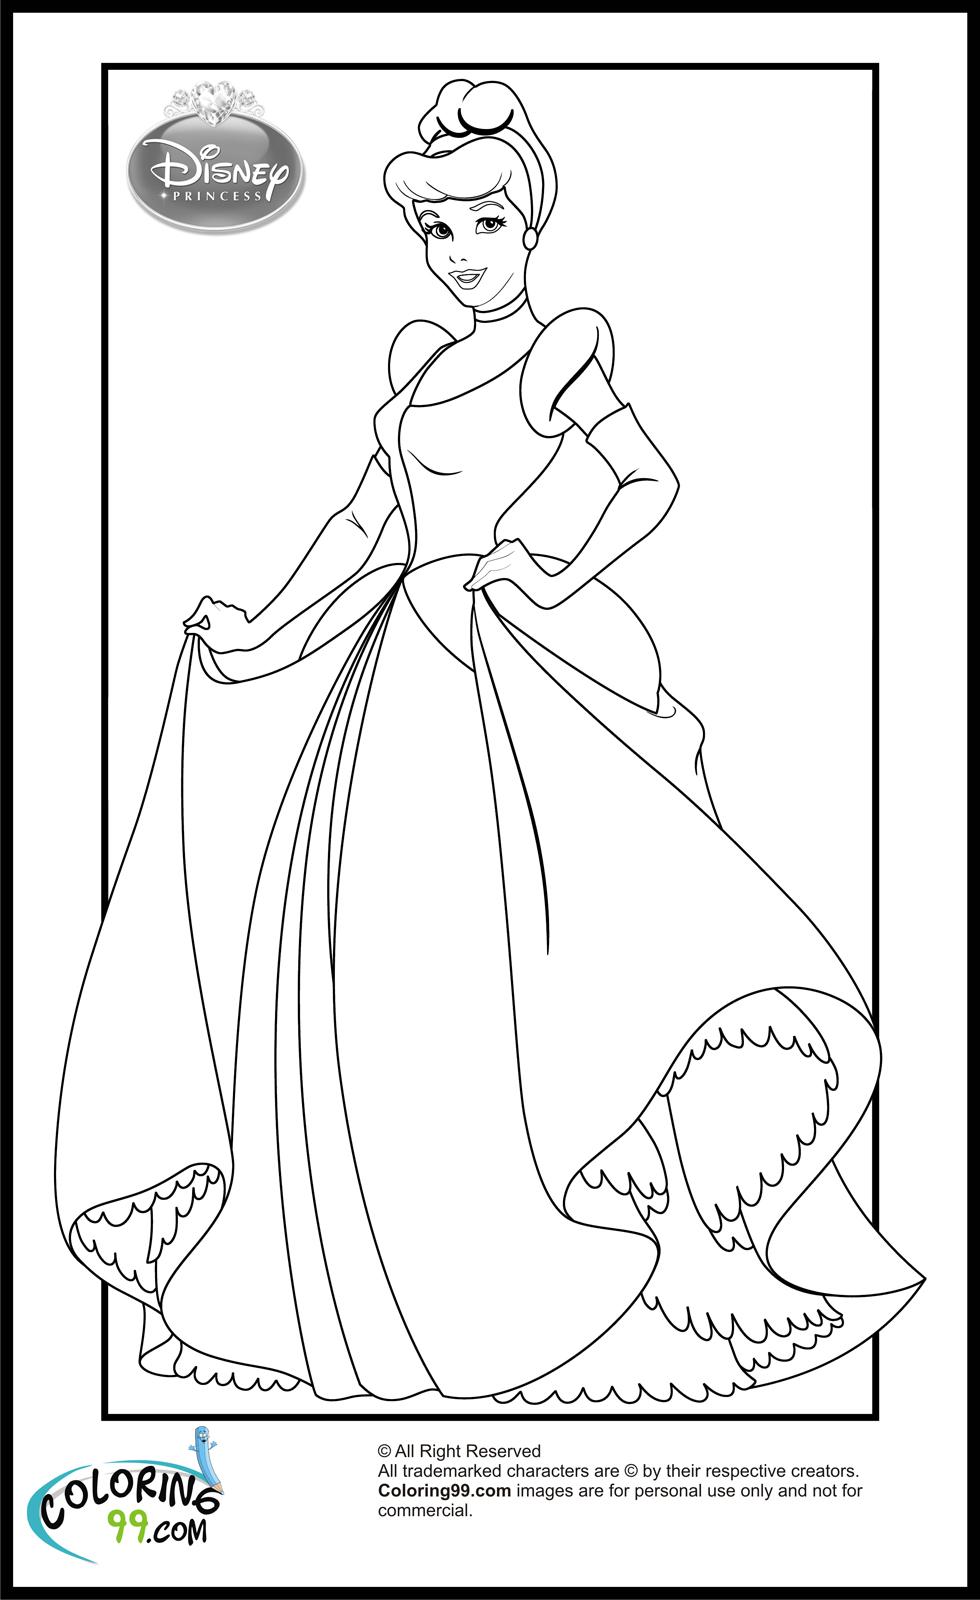 princess coloring page transmissionpress disney princess coloring pages page princess coloring